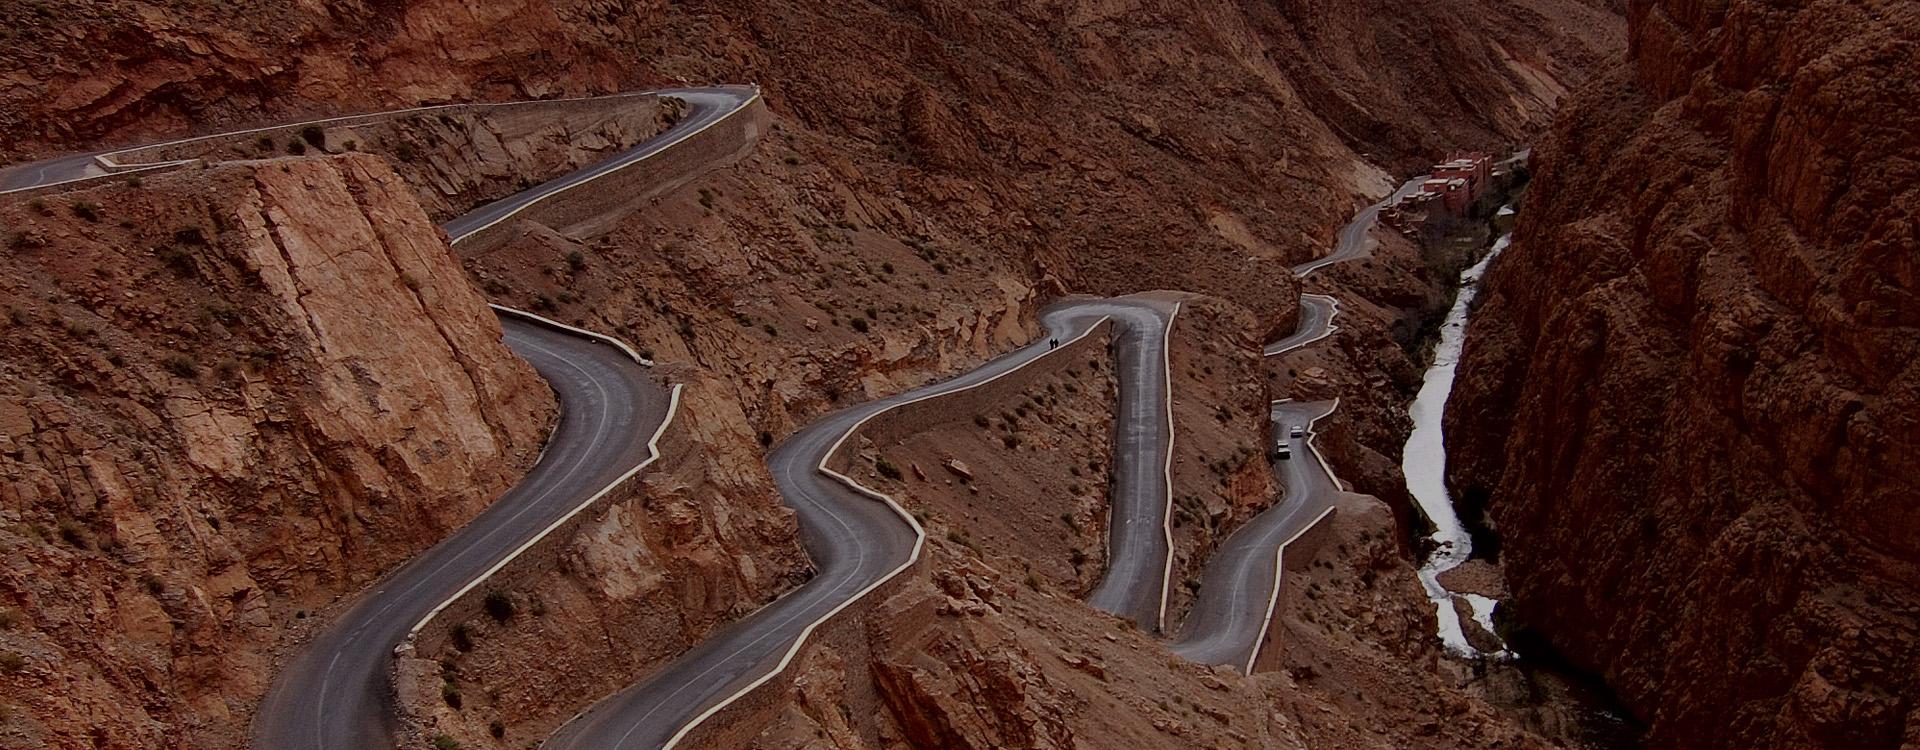 voyage moto au Maroc avec Monsieur Pingouin